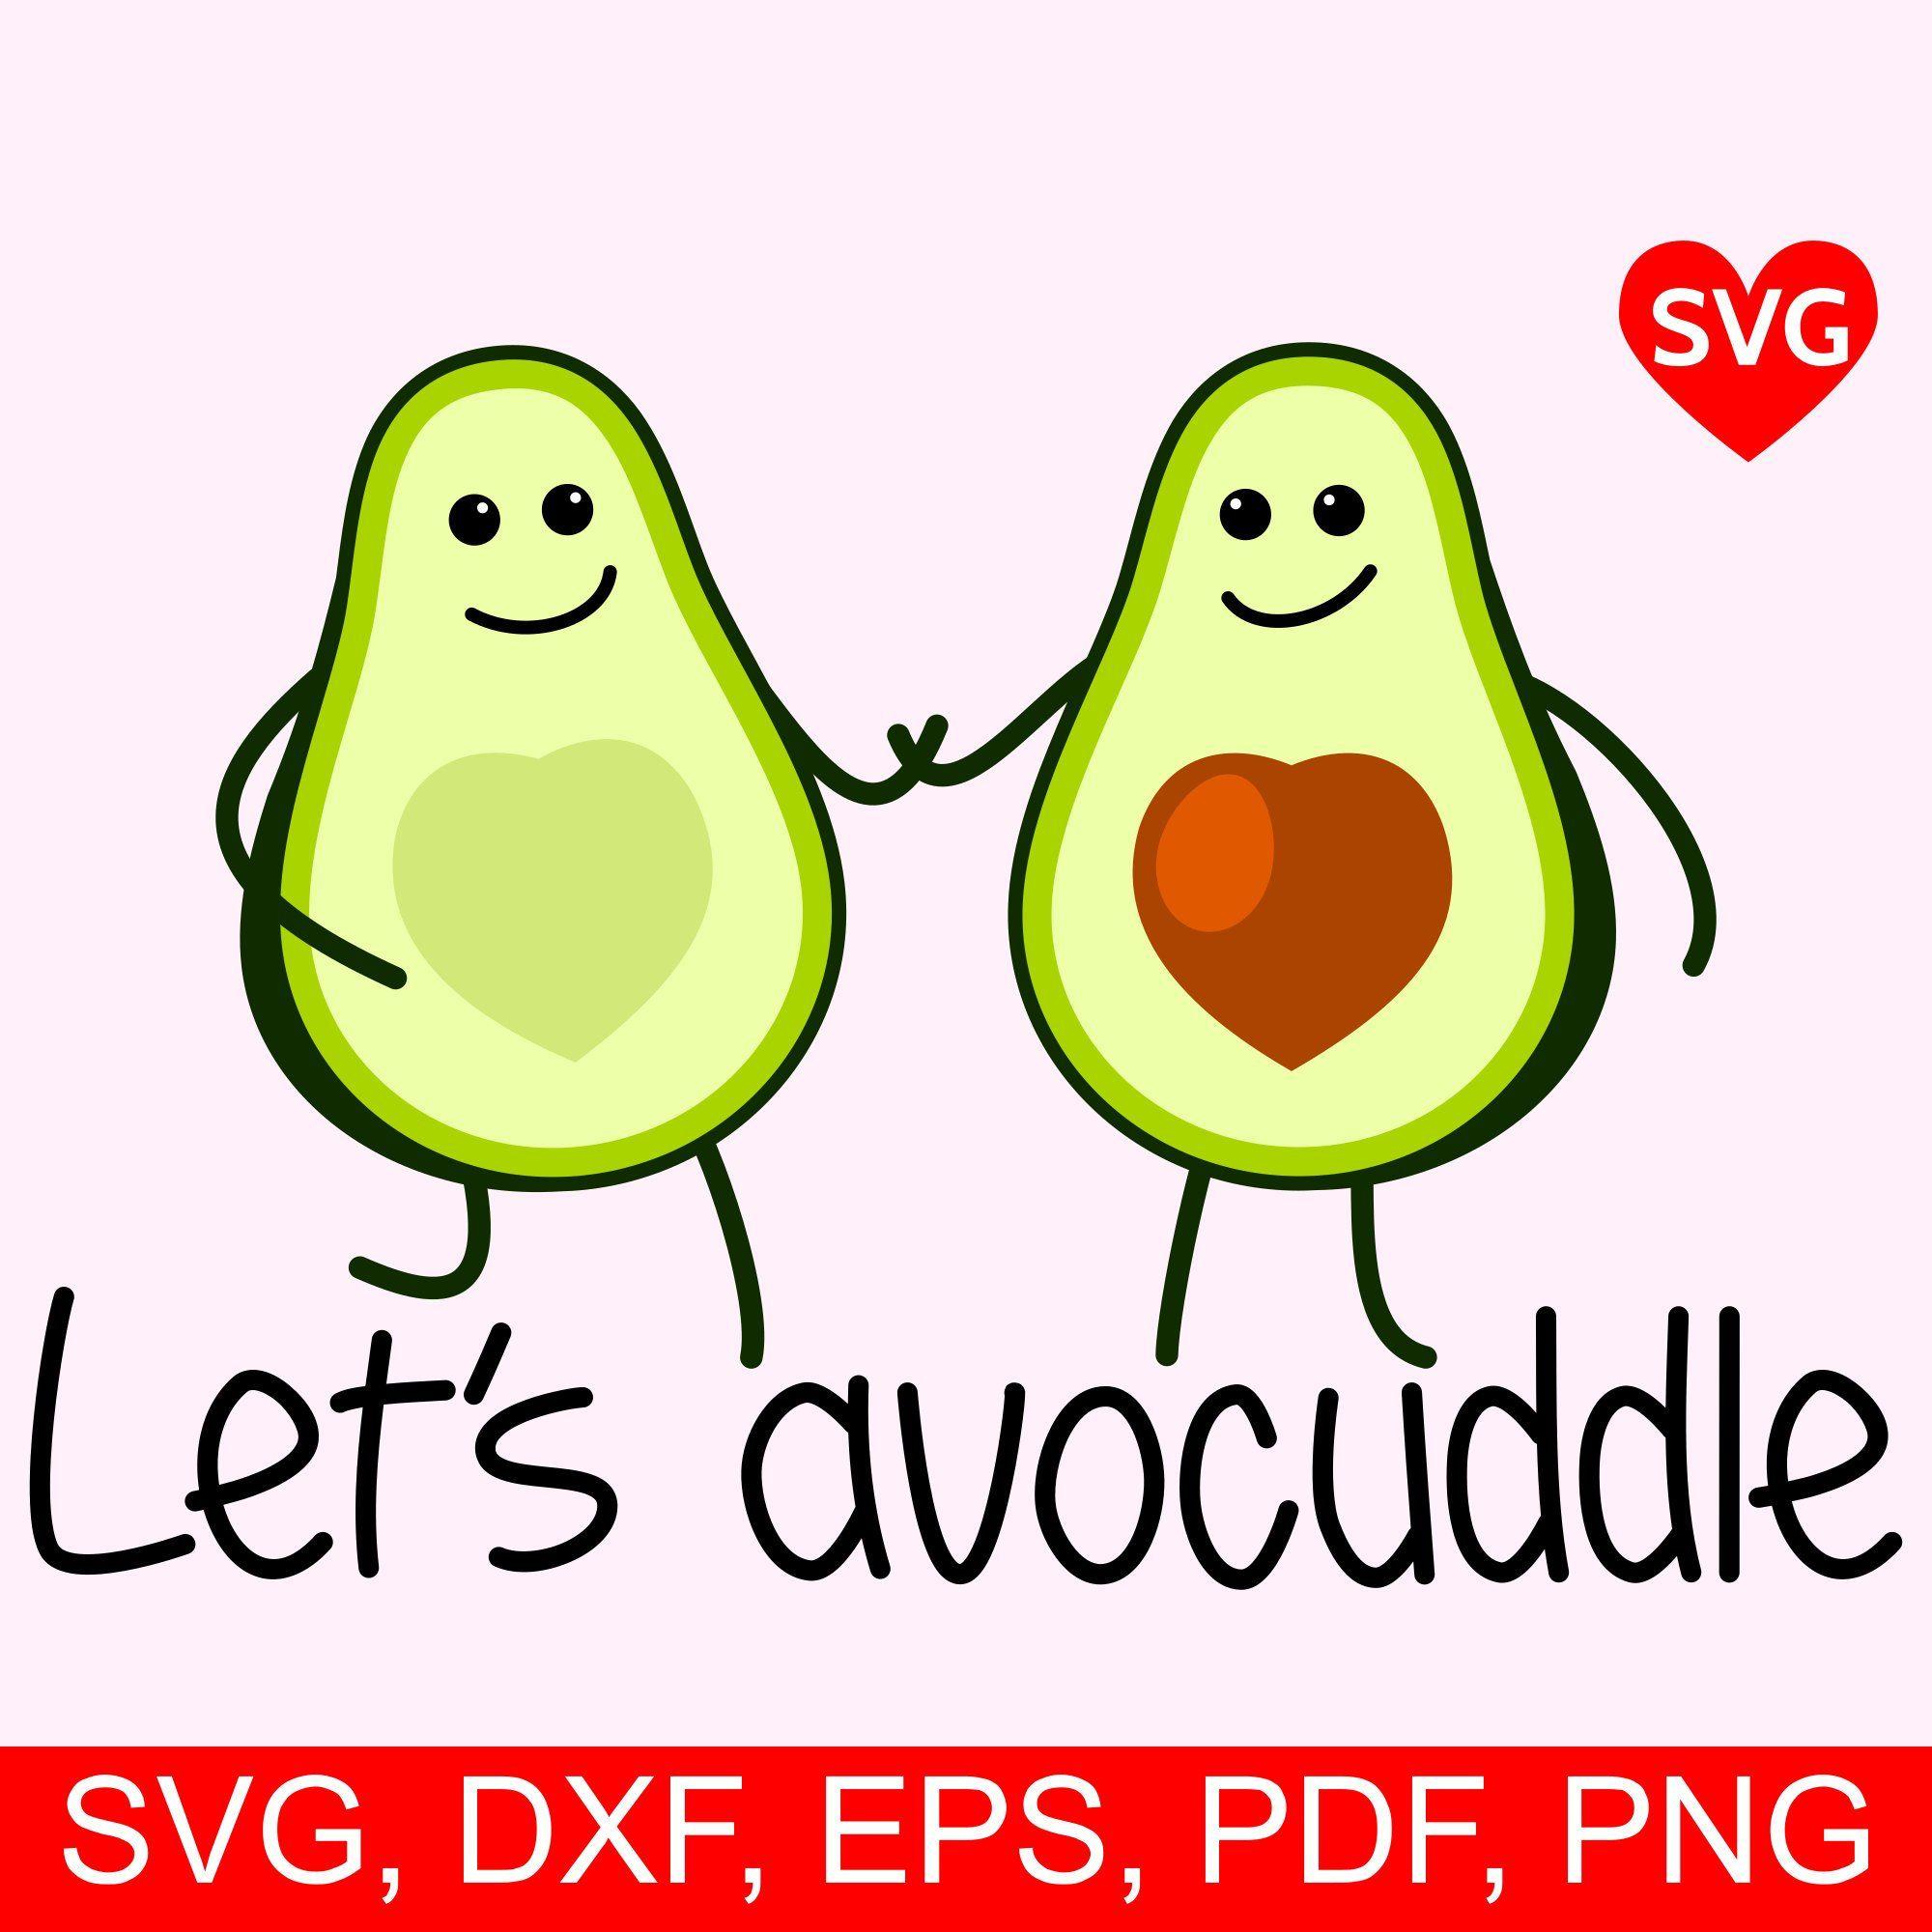 Avocado SVG Let's Avocuddle Clip art, Valentines svg